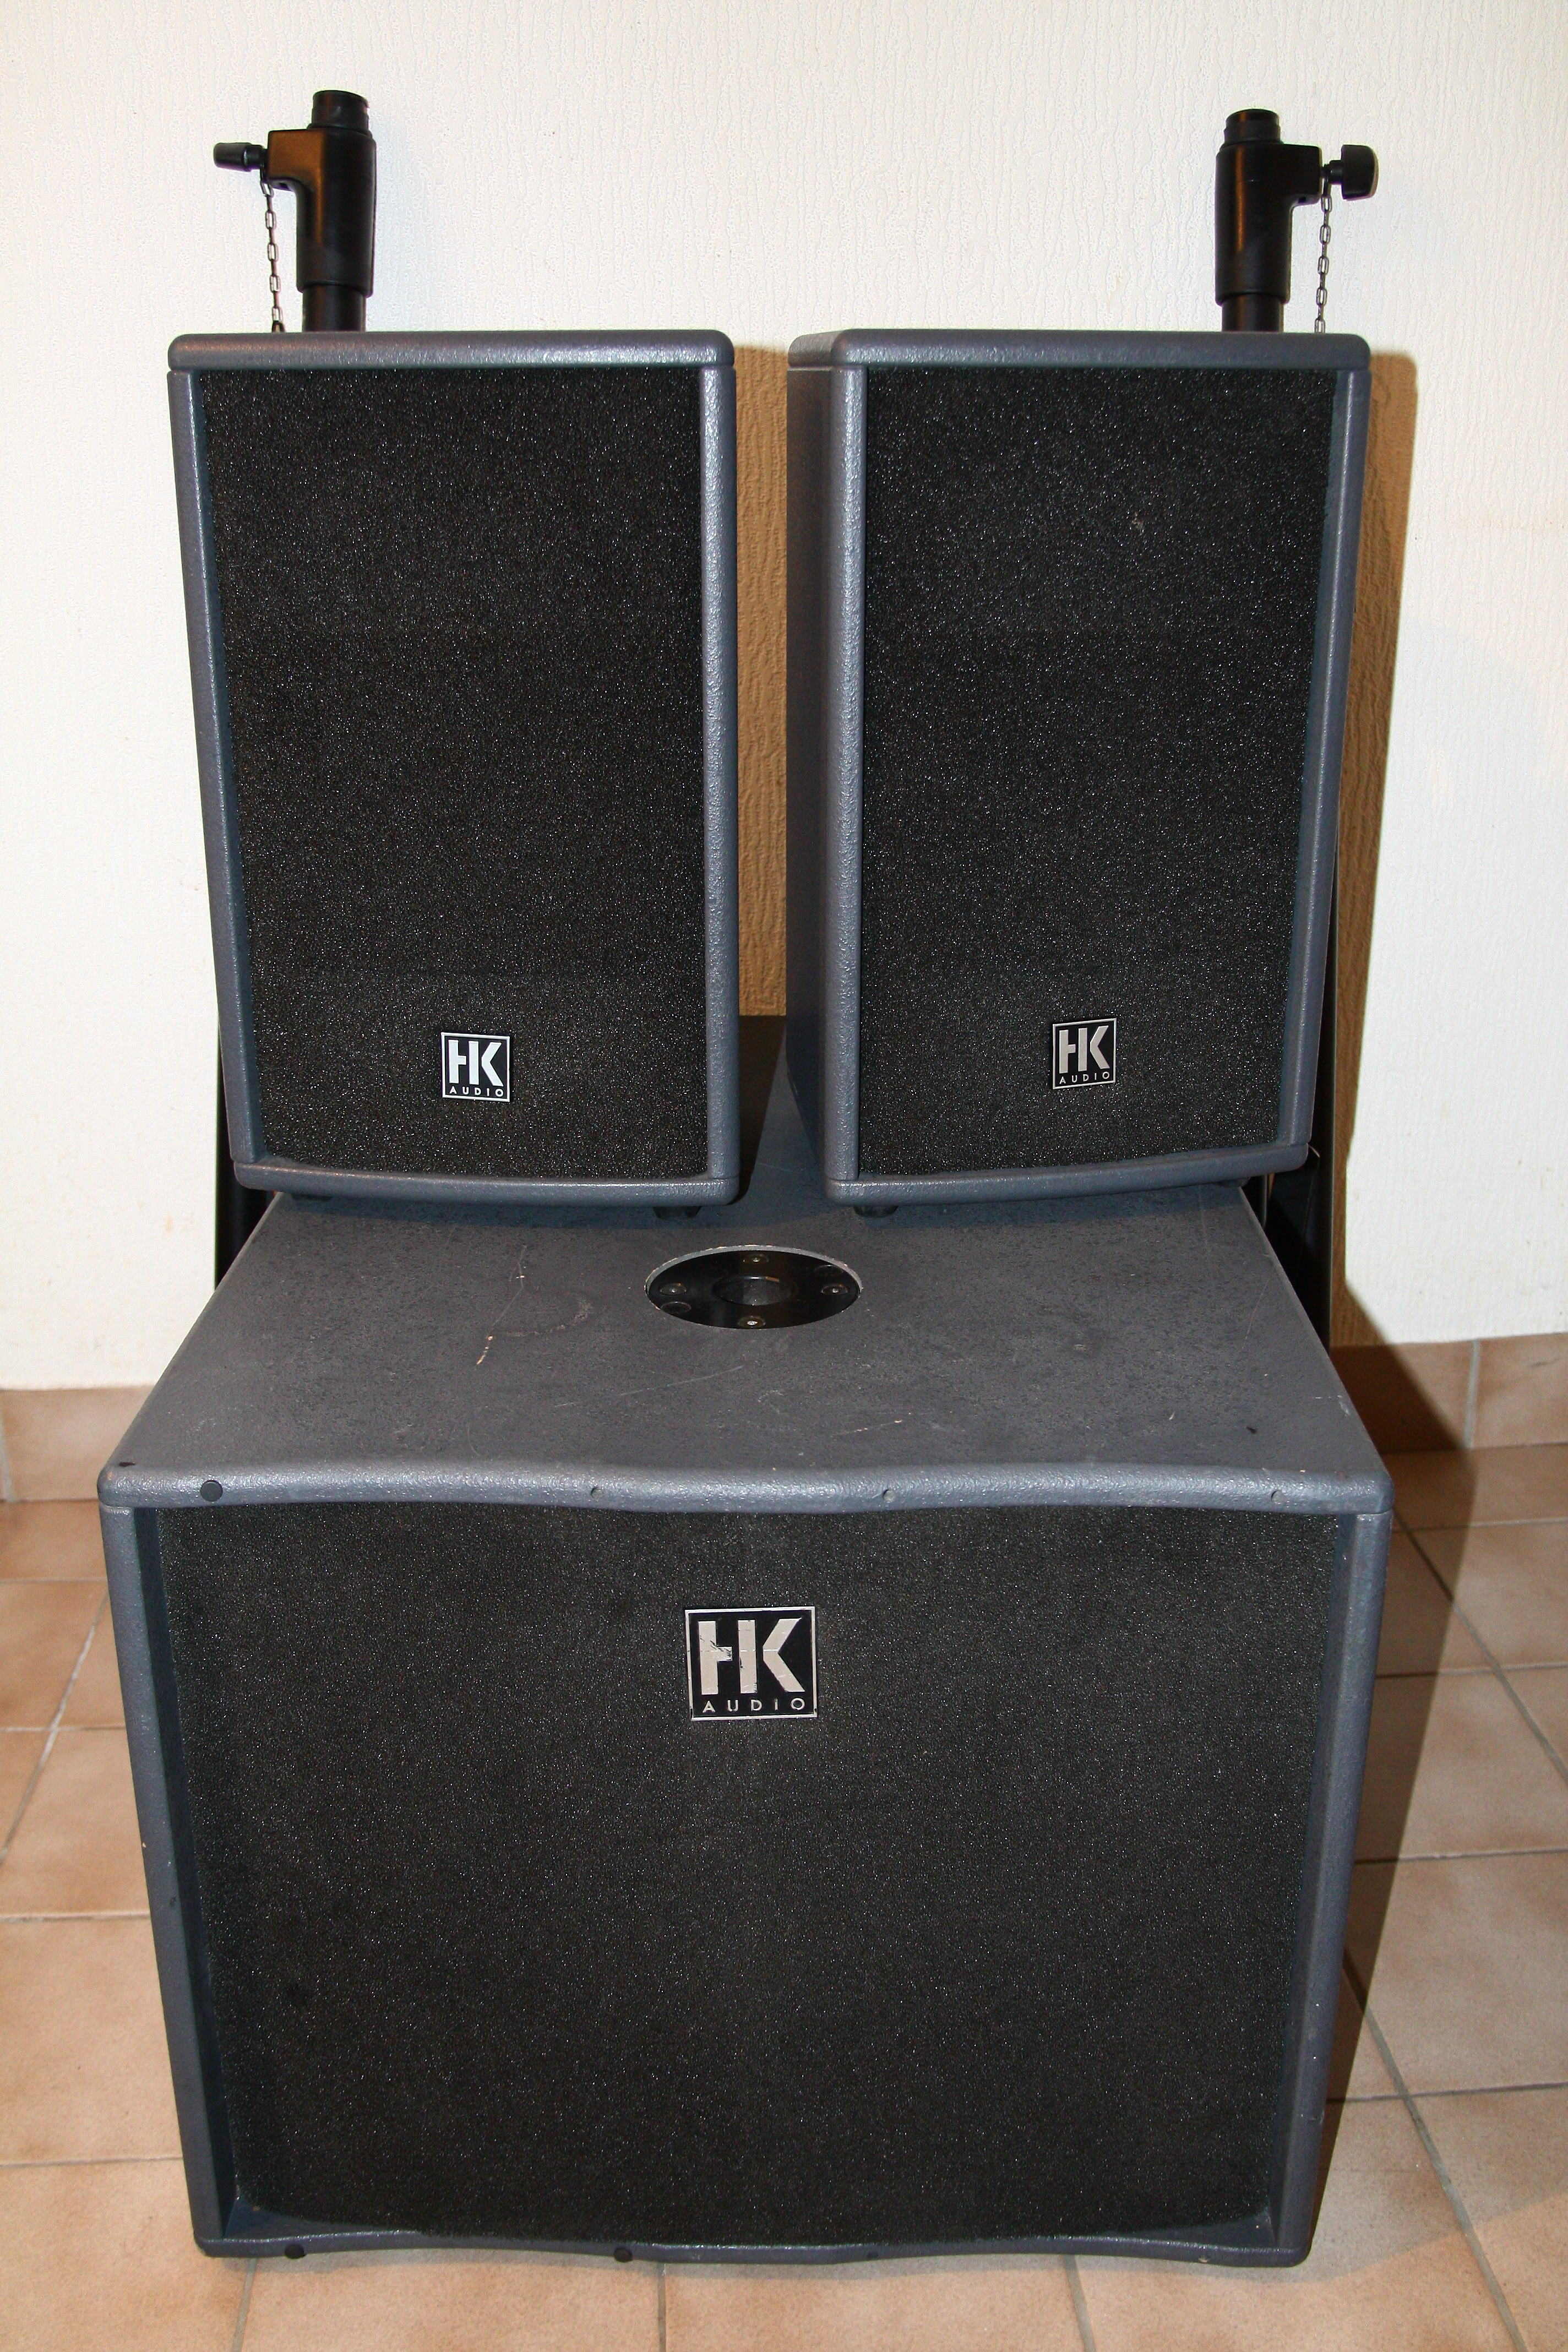 hk audio lucas 600 image 682835 audiofanzine. Black Bedroom Furniture Sets. Home Design Ideas